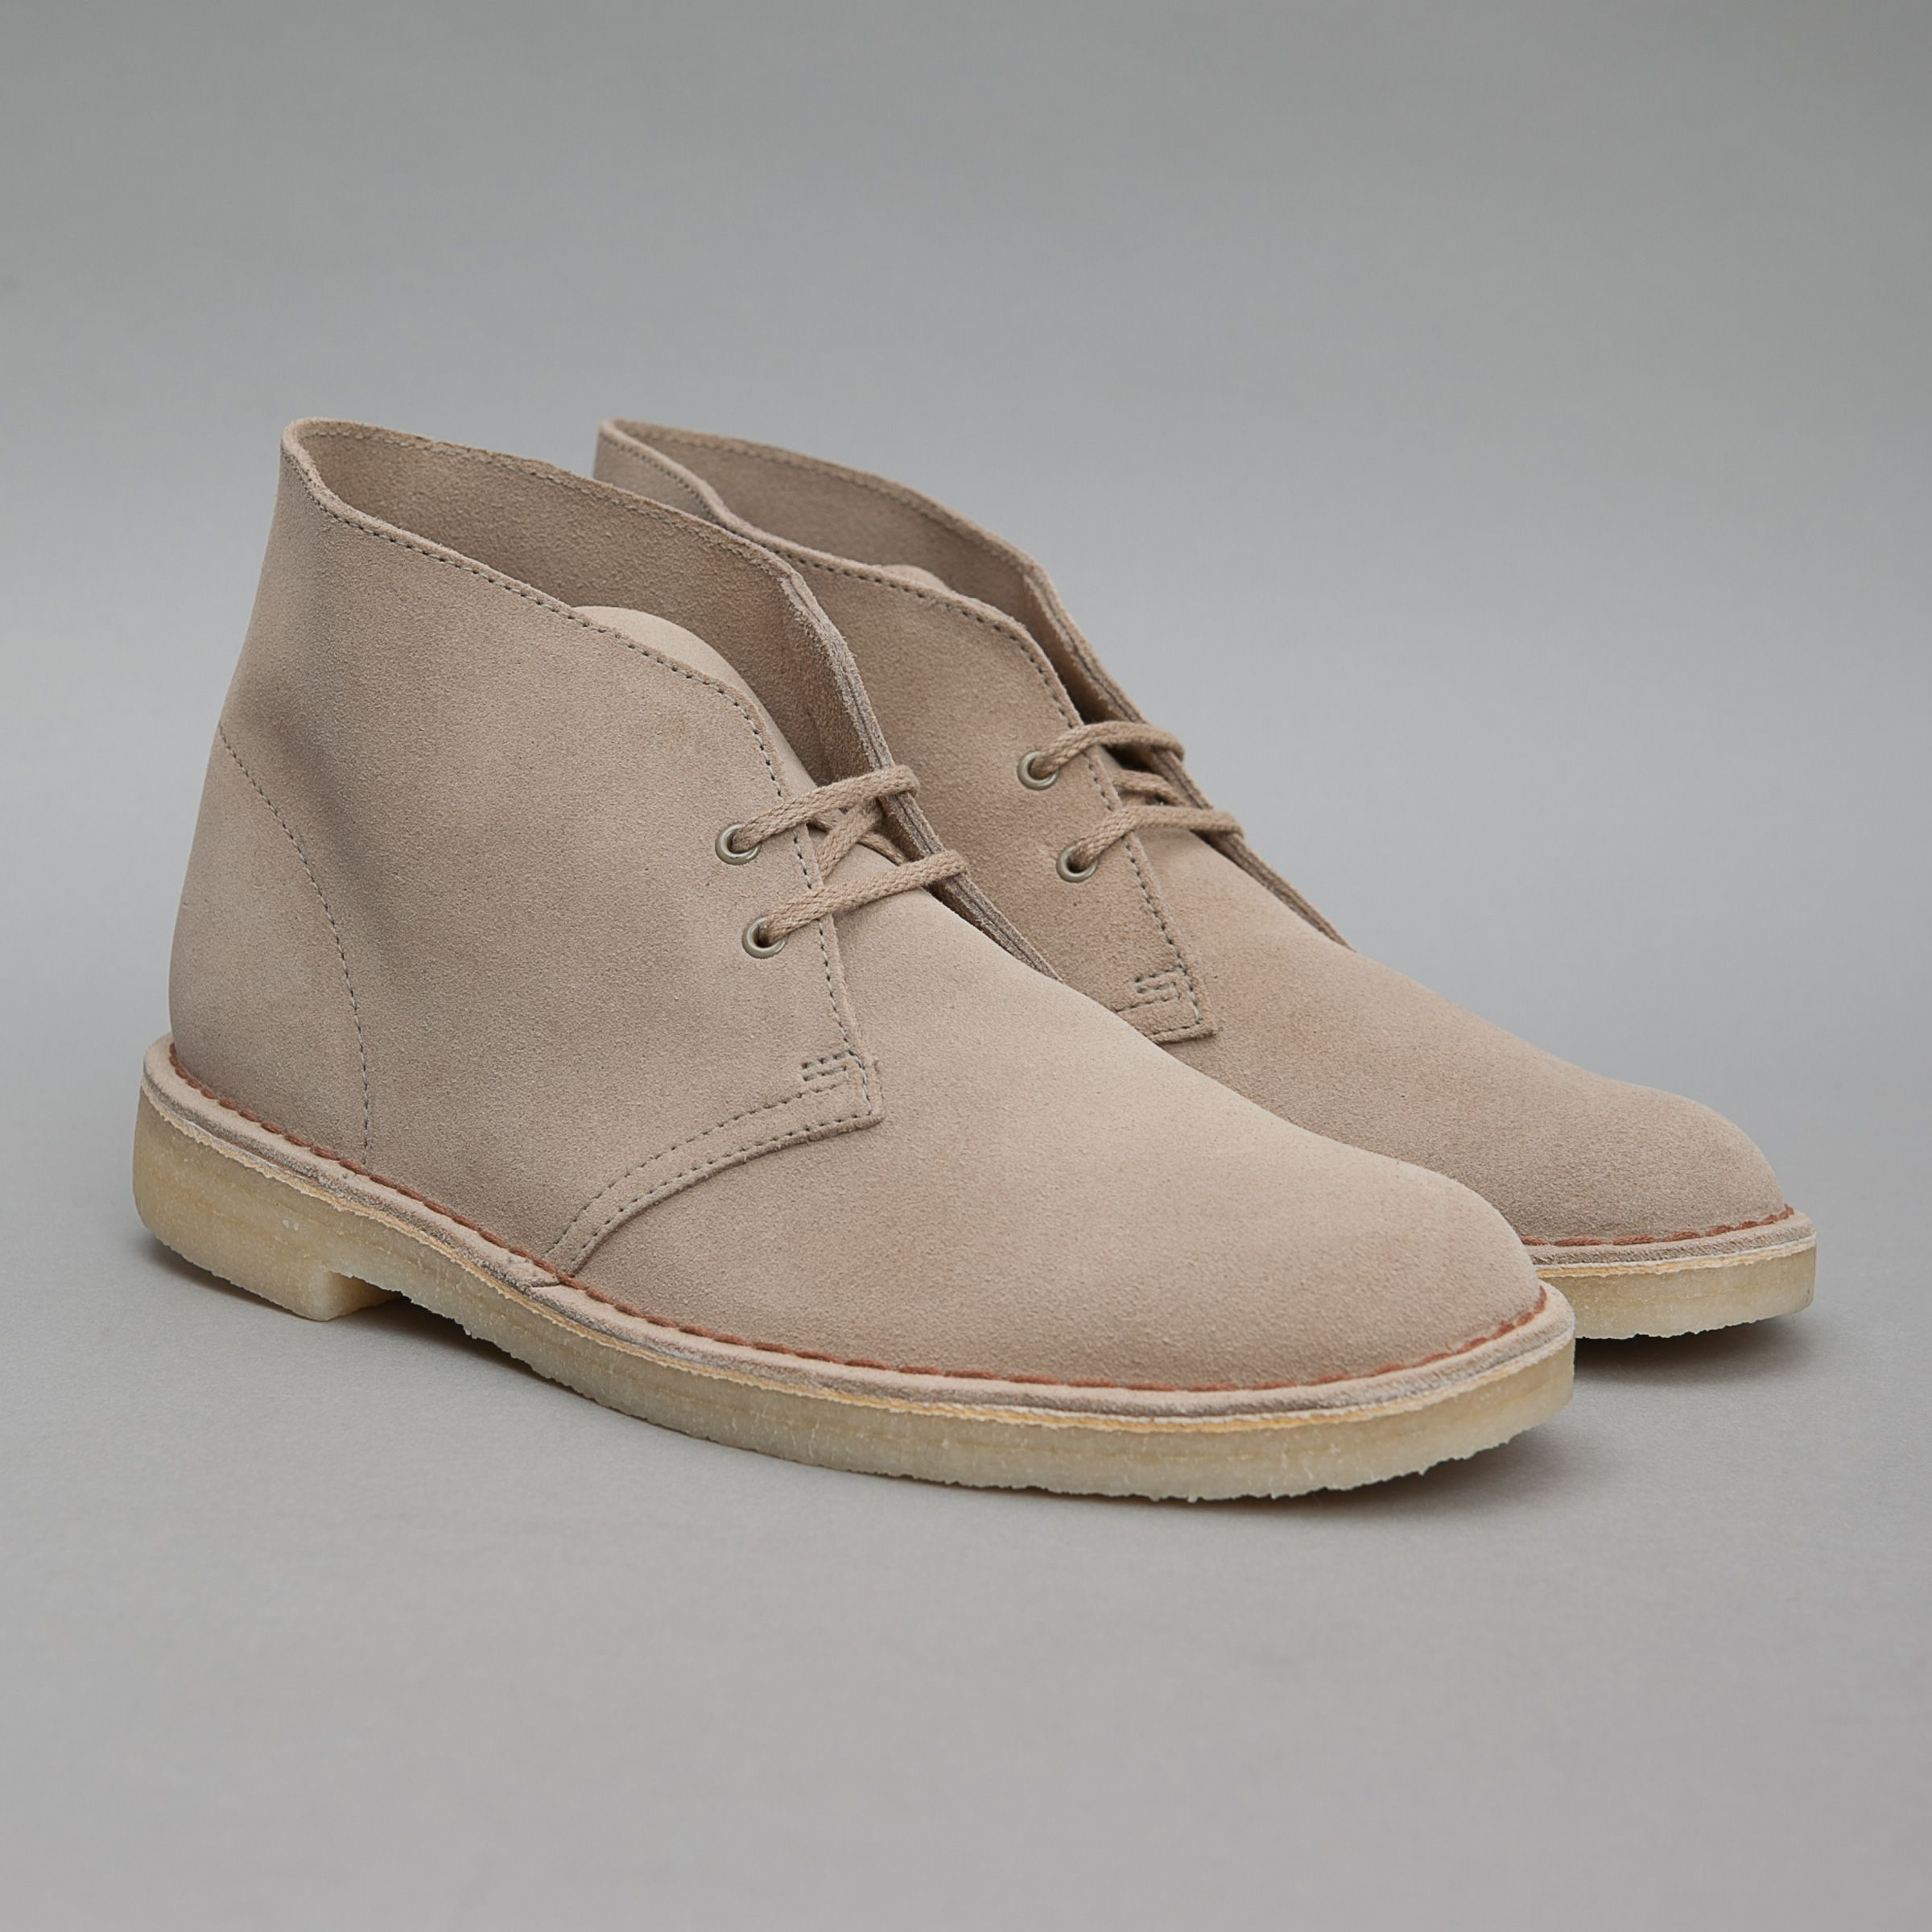 Boots homme Clarks Originals Desert Boot